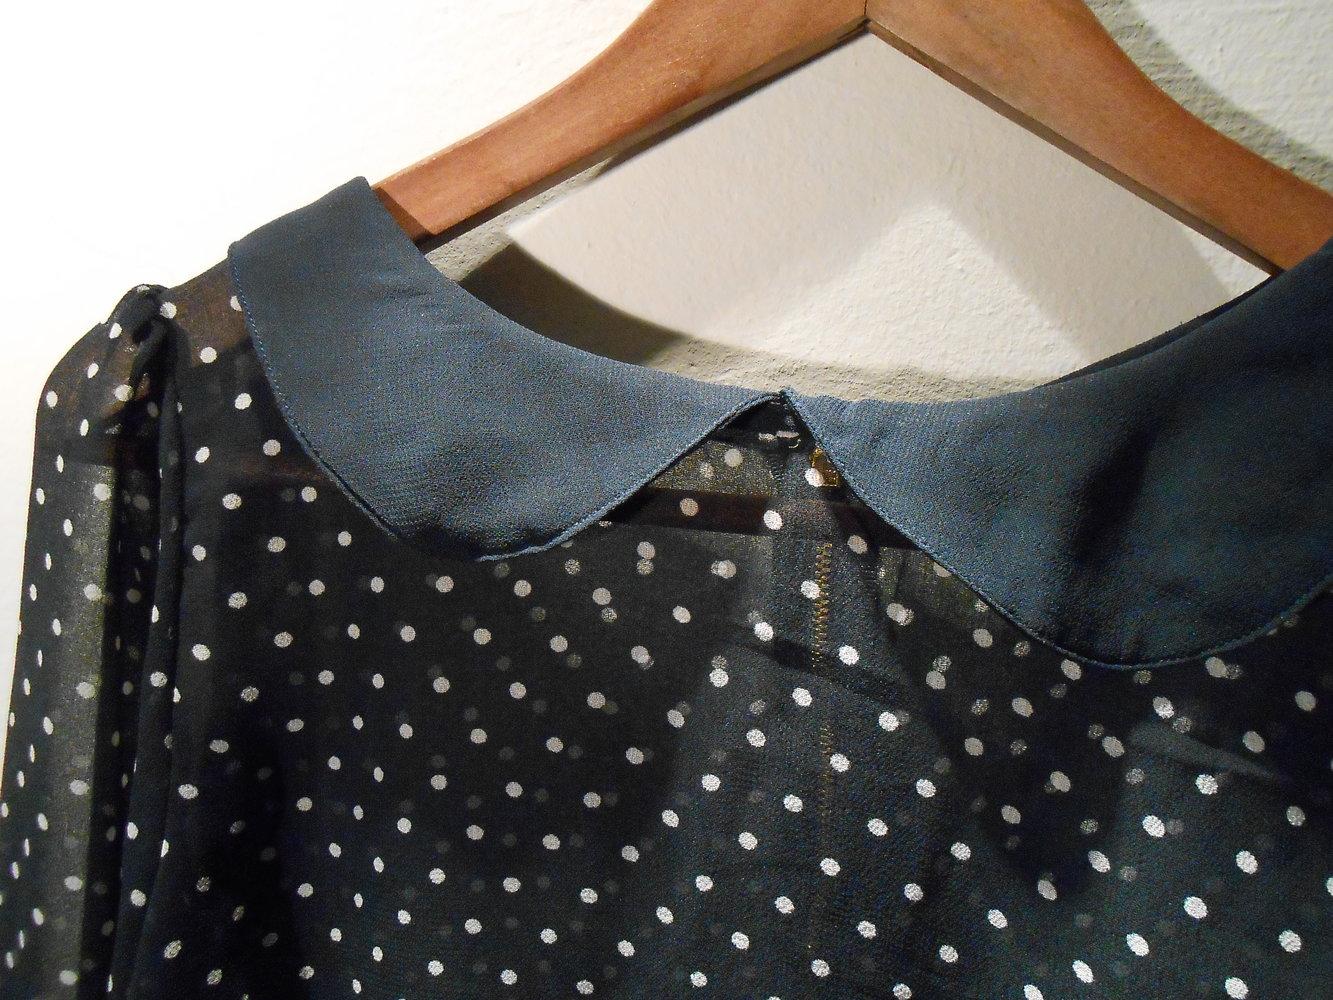 gepunktete bluse mit bubi kragen. Black Bedroom Furniture Sets. Home Design Ideas